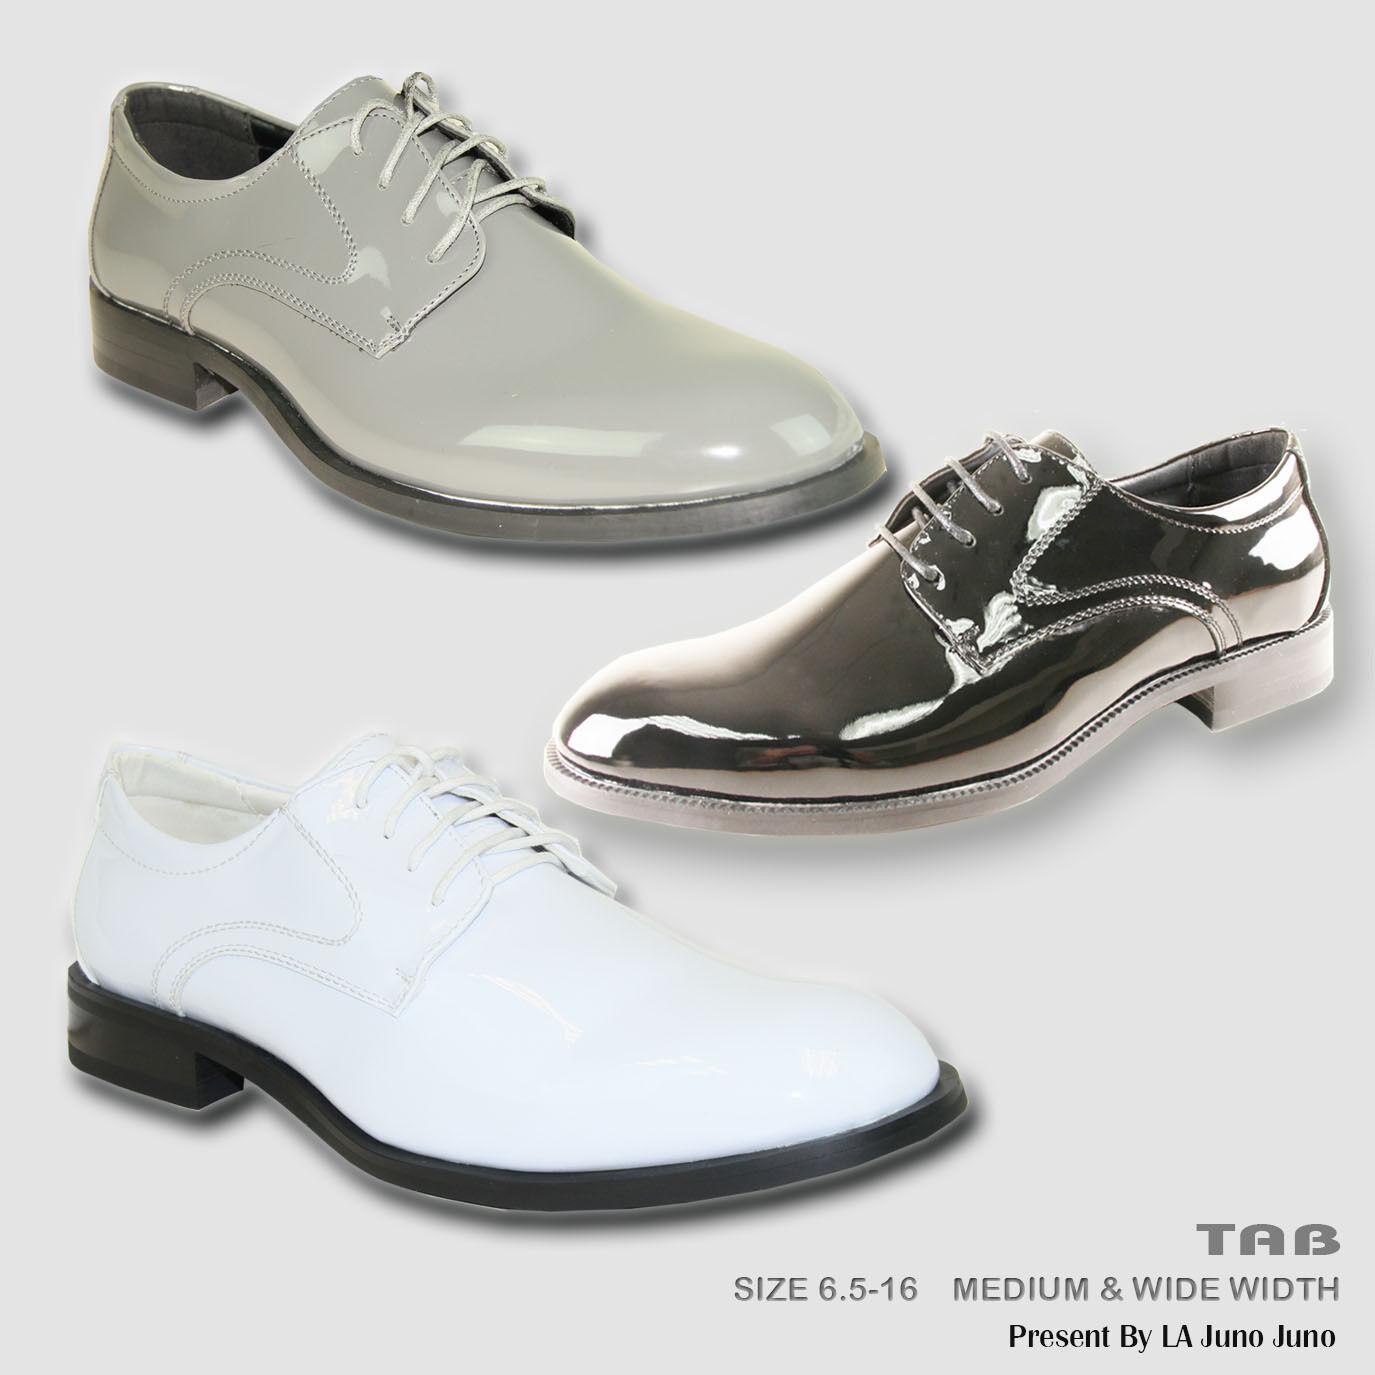 VANGELO TAB New Men Dress Shoes TAB VANGELO Tuxedo For Formal Wedding and Prom Wrinkle Free 9ea5ff